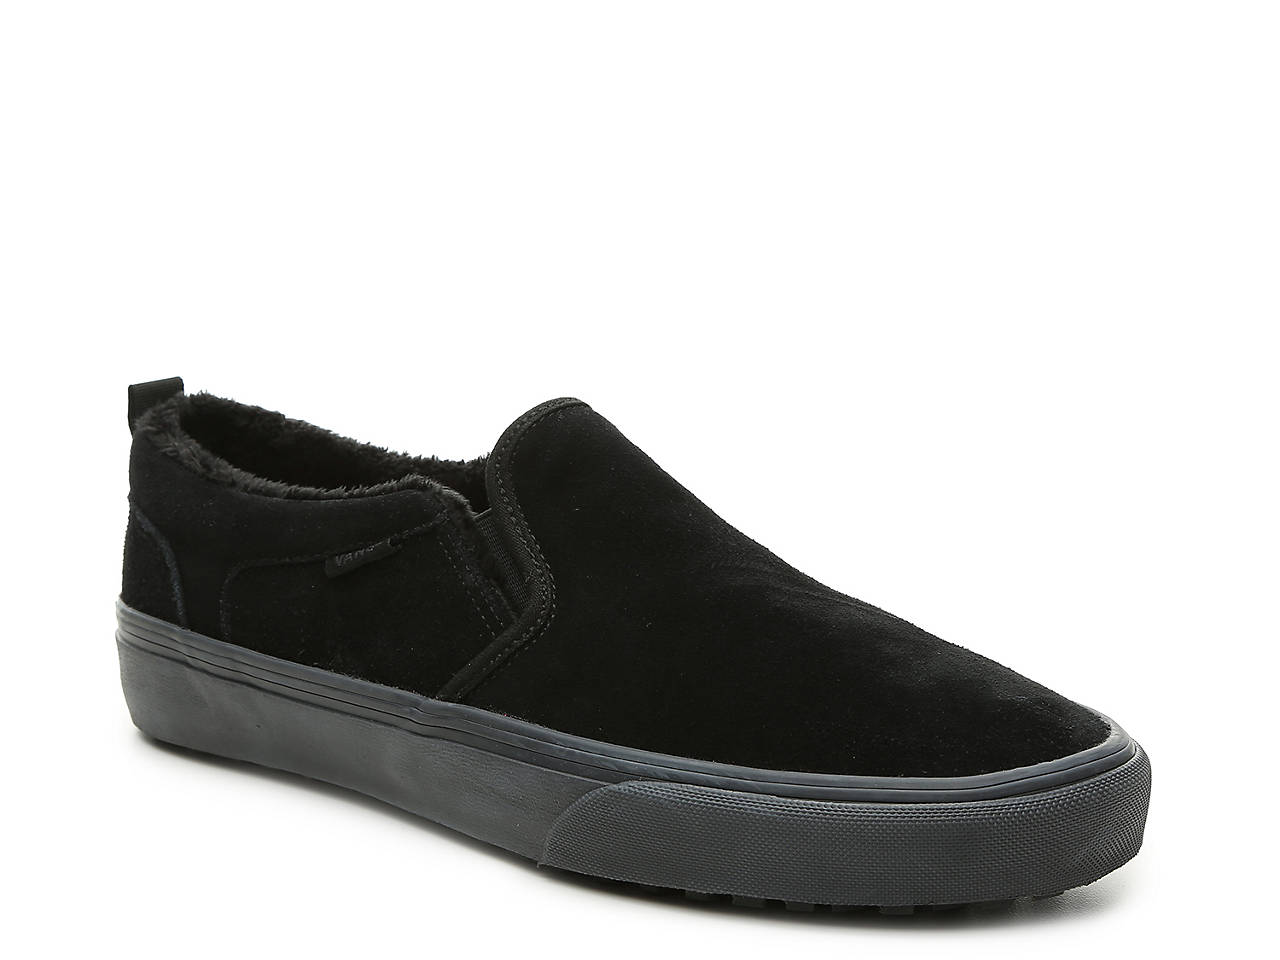 vans slip on shoes mens